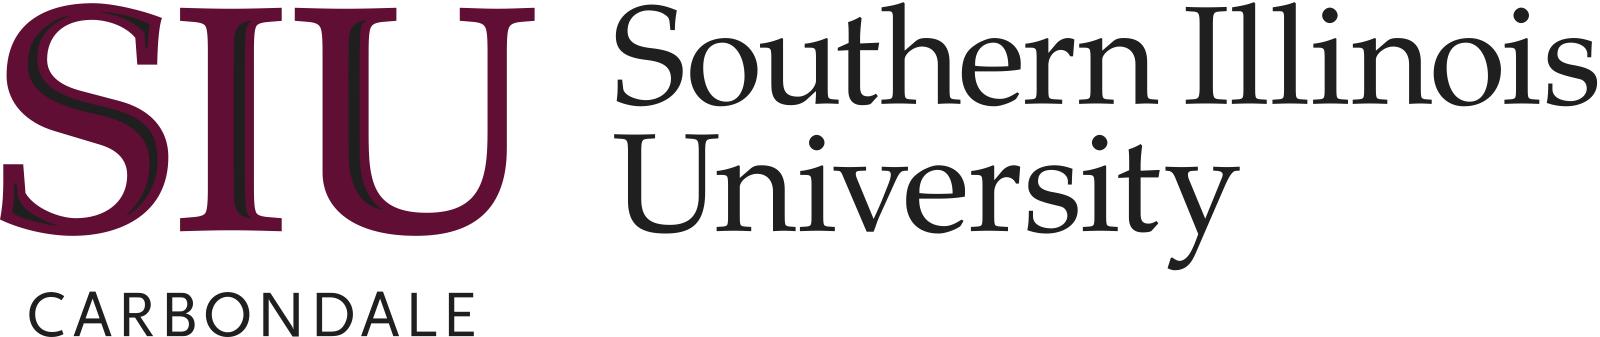 Southern Illinois University- Carbondale